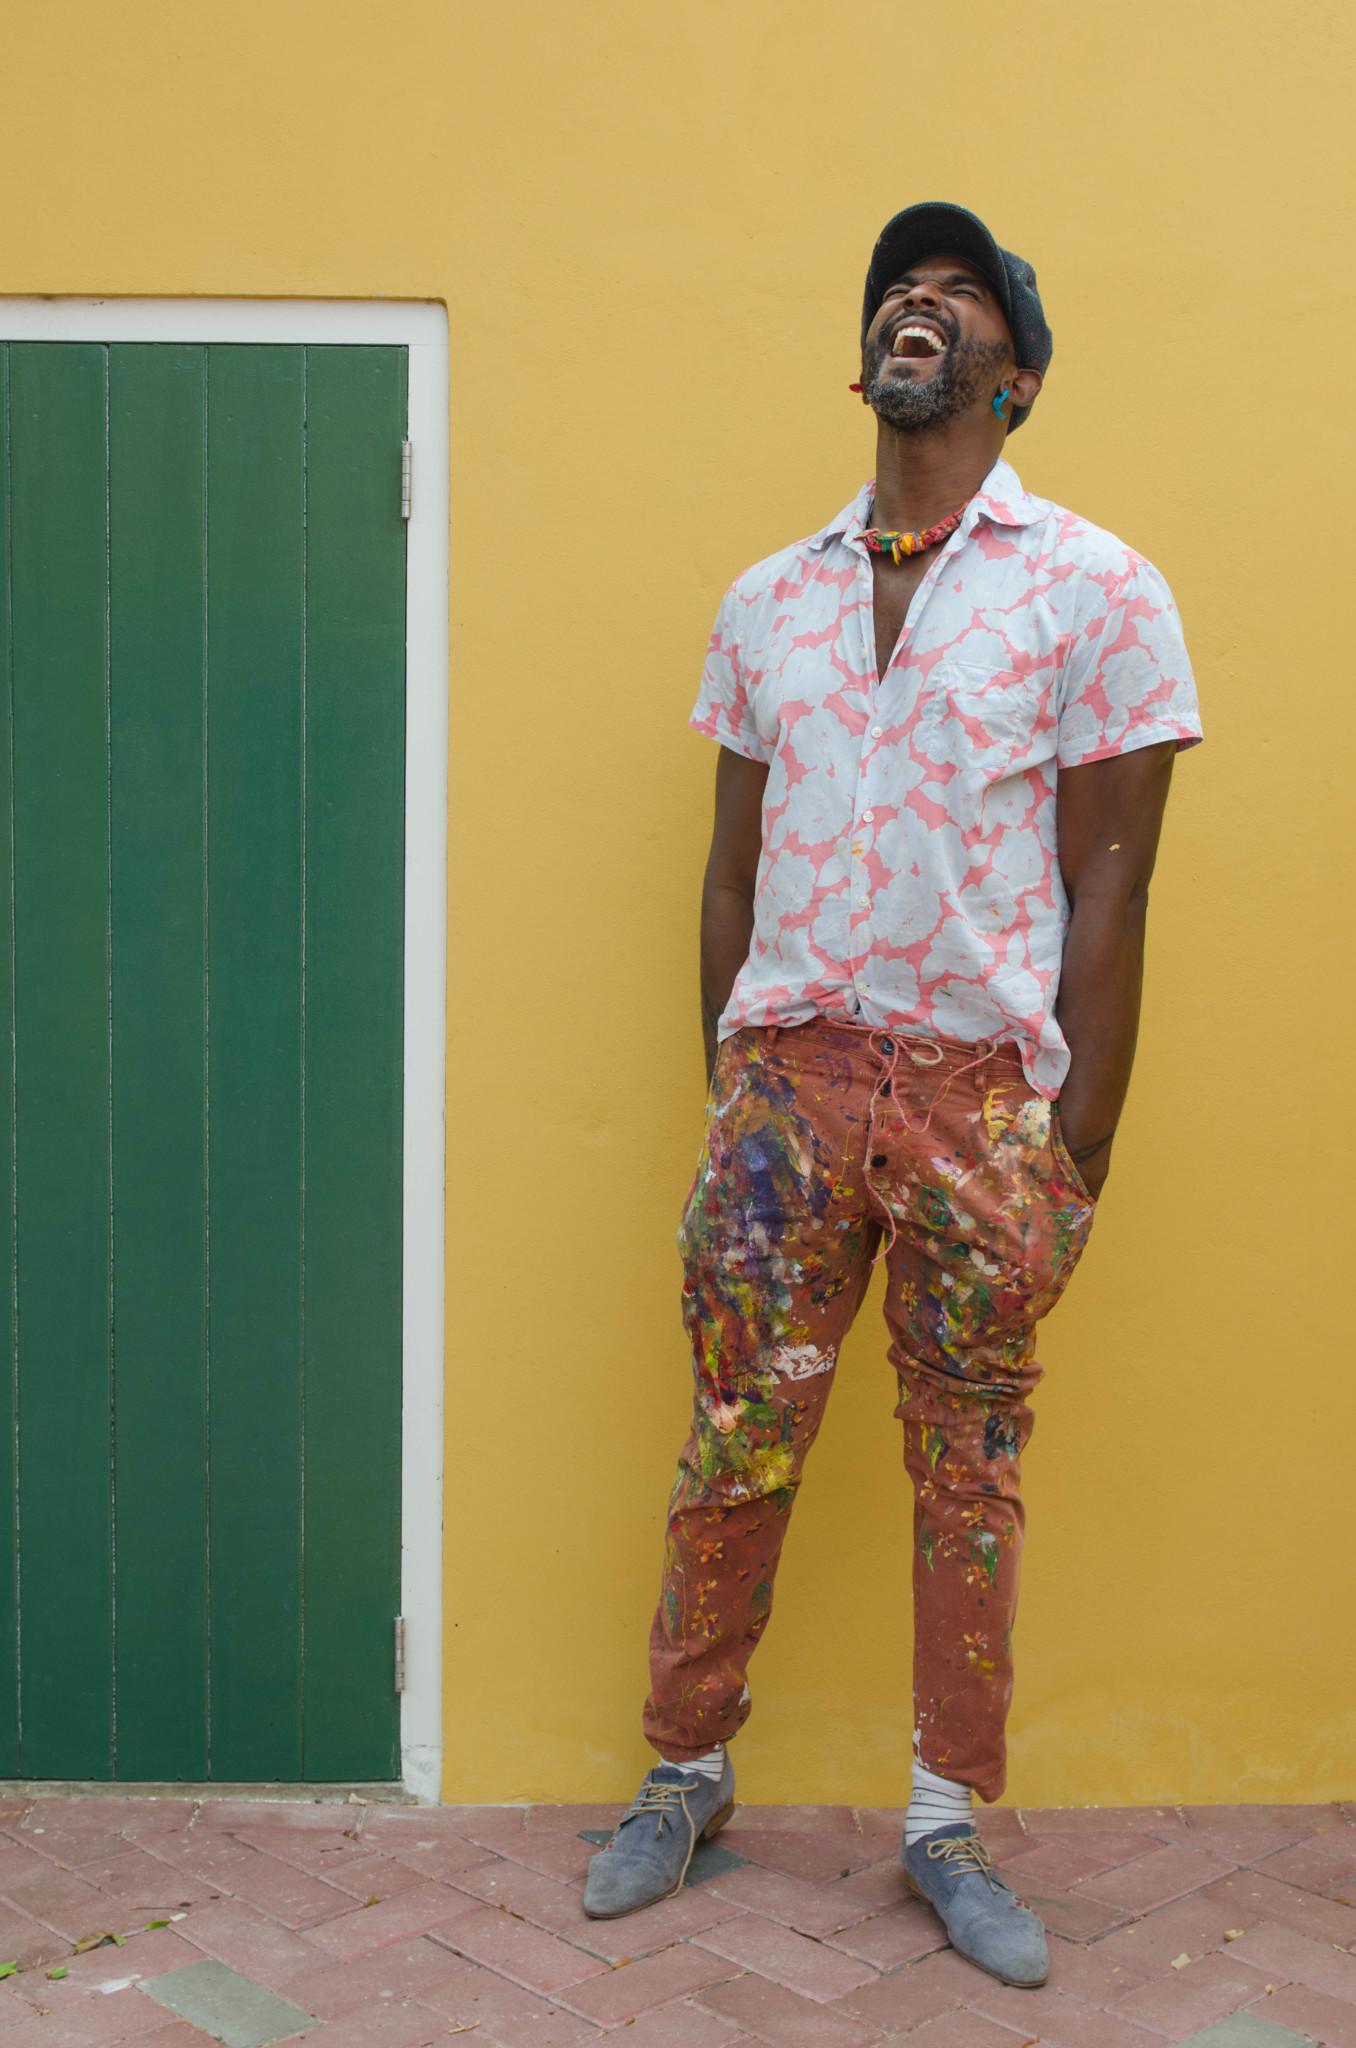 Francis Sling Künstler auf Curacao